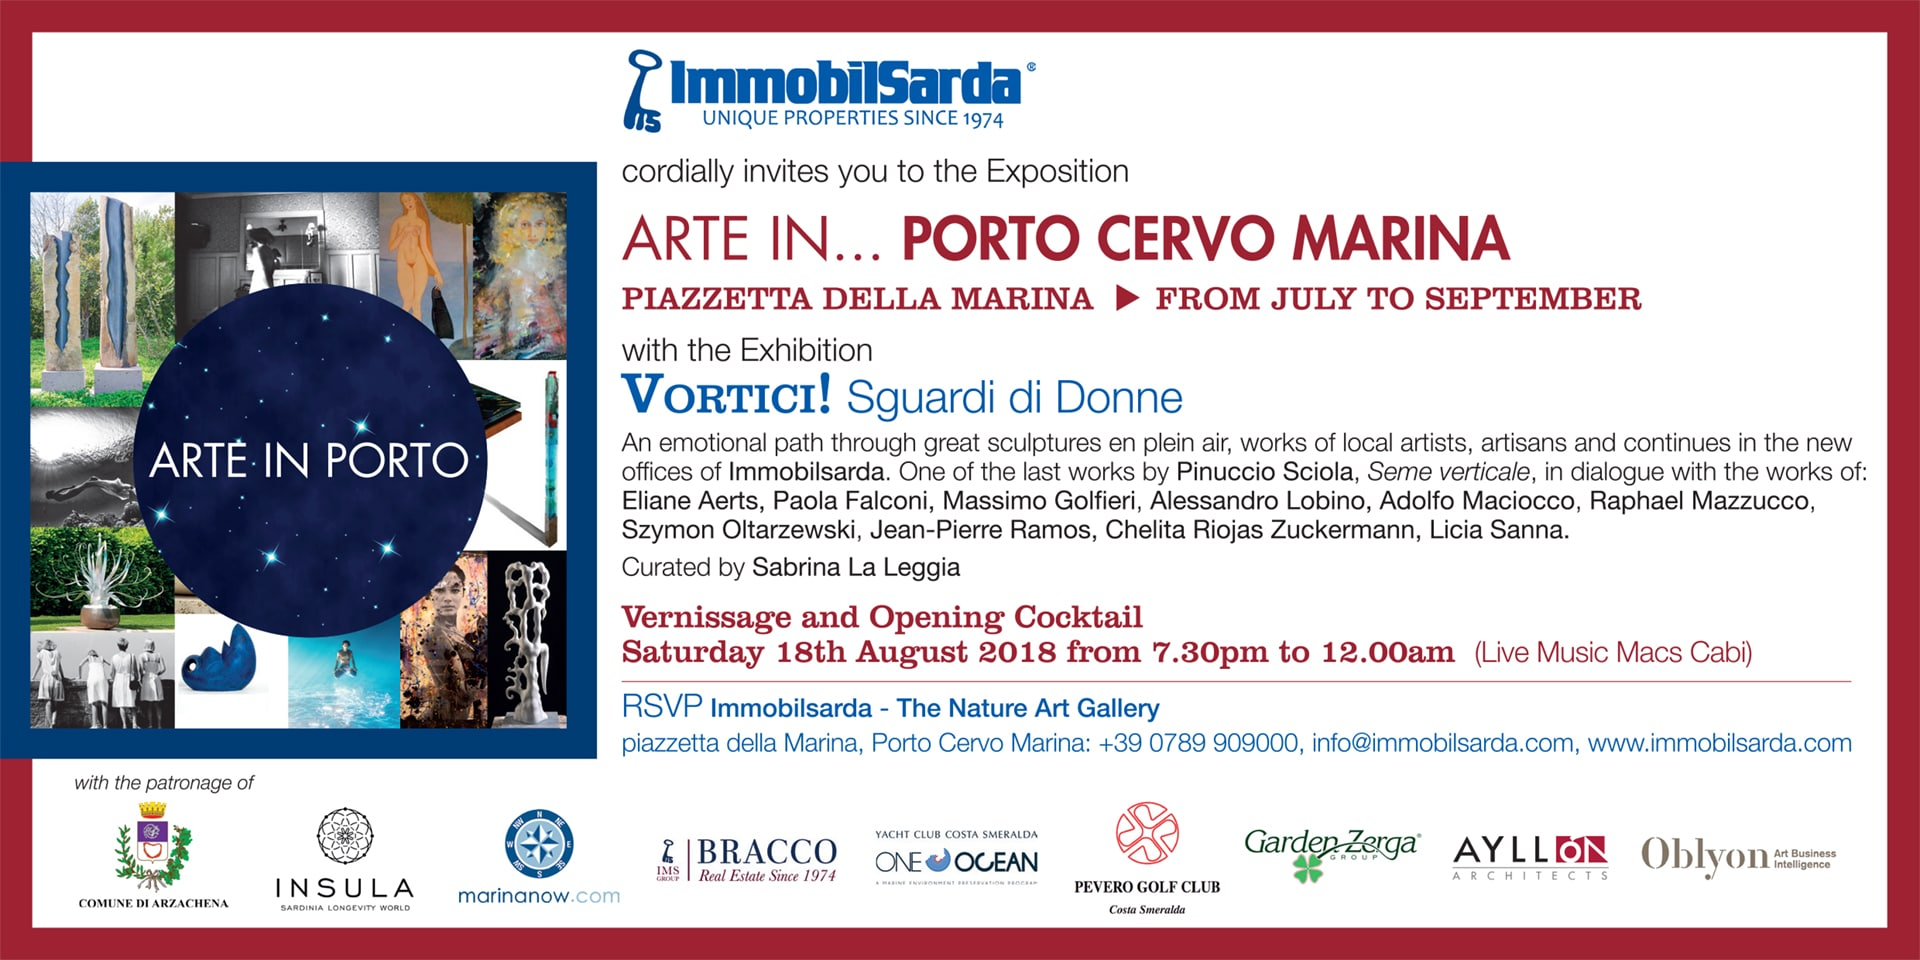 ARTE IN… PORTO CERVOMARINA – 18 Agosto Opening Cocktail